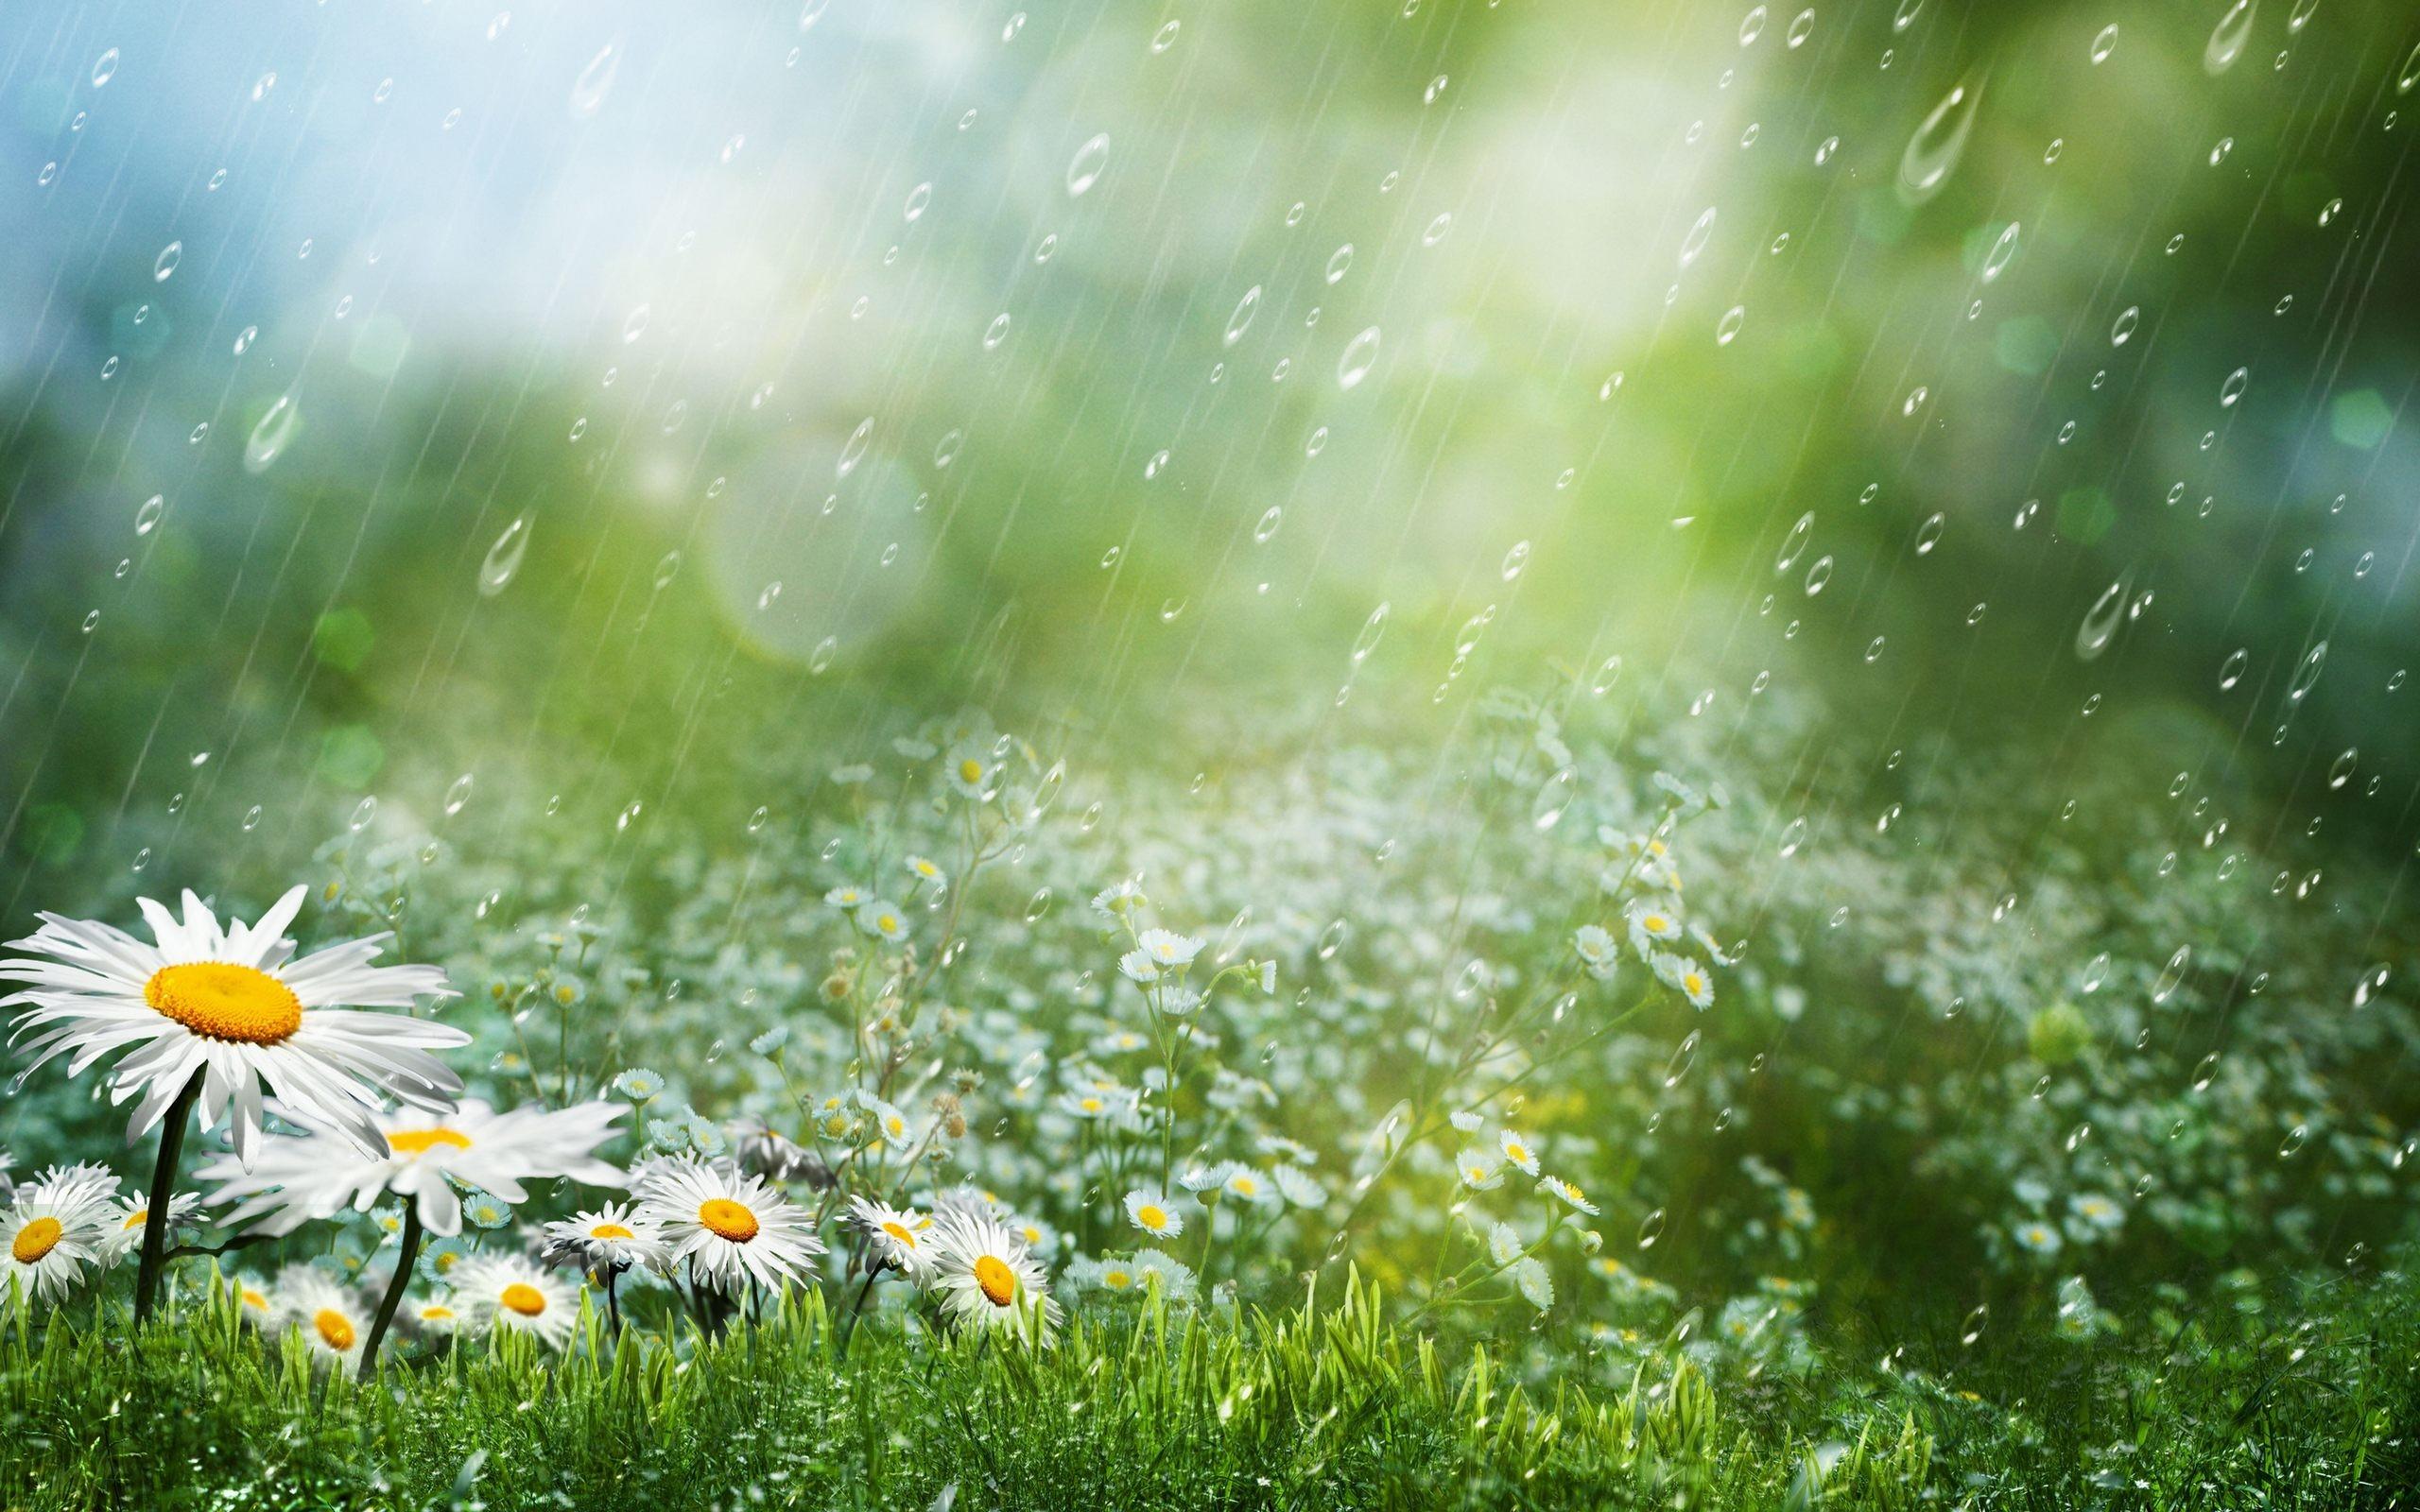 Rain wallpaper HD ·① Download free awesome full HD ...